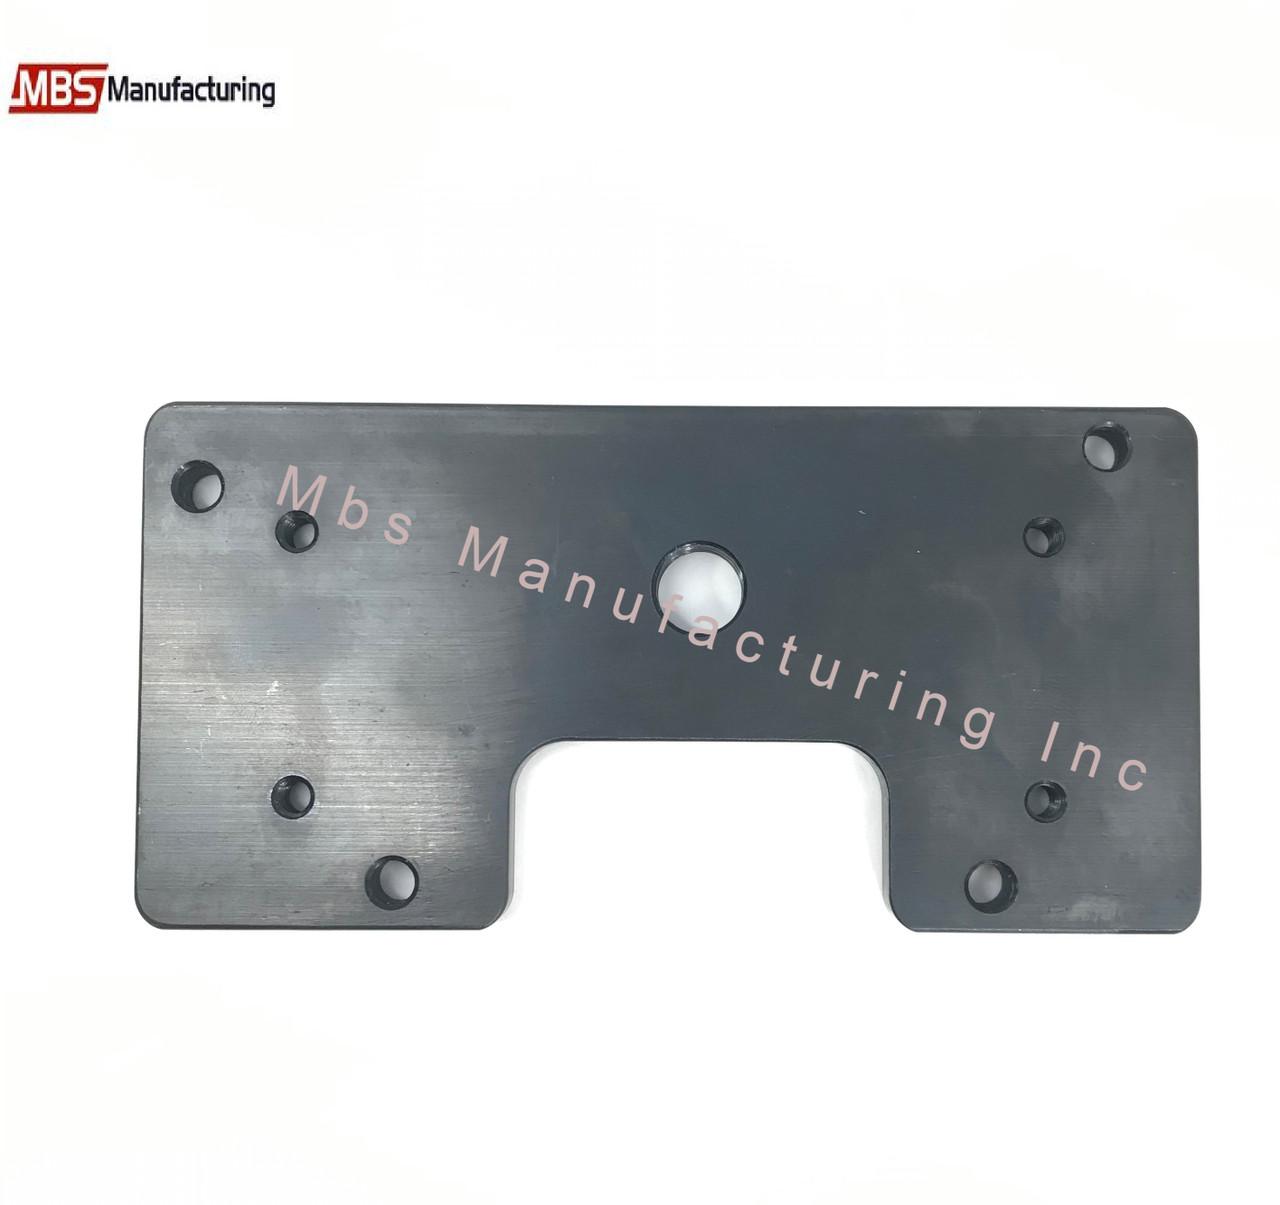 Harley Davidson Camshaft Needle Bearing Installer Milwaukee Eight (M8)